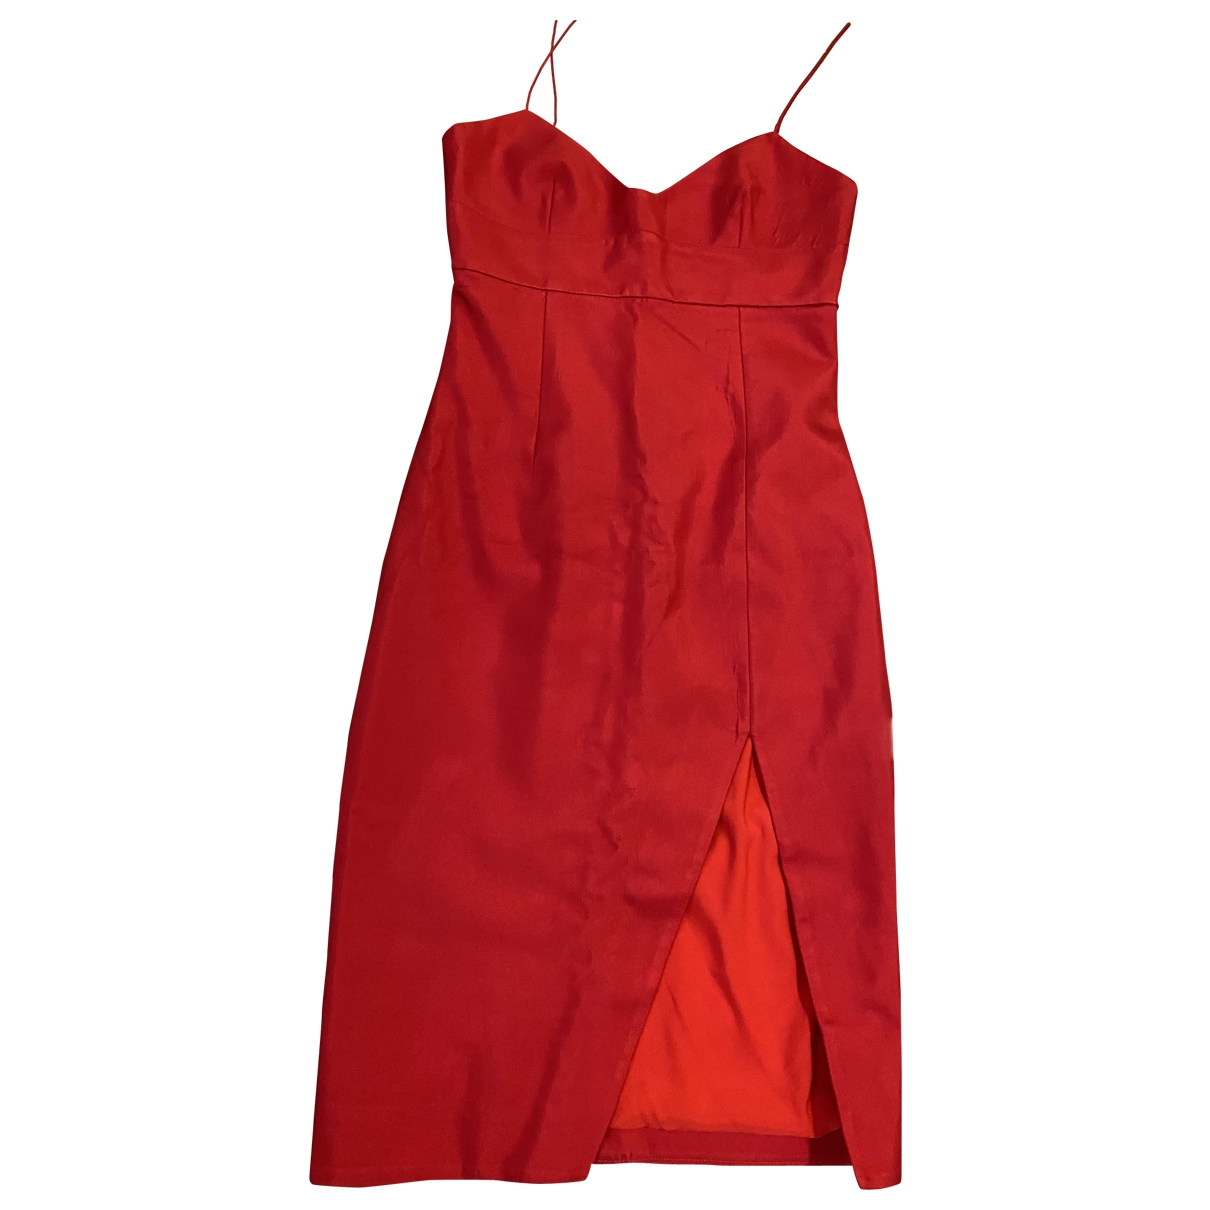 Nicholas \N Red dress for Women 38 FR